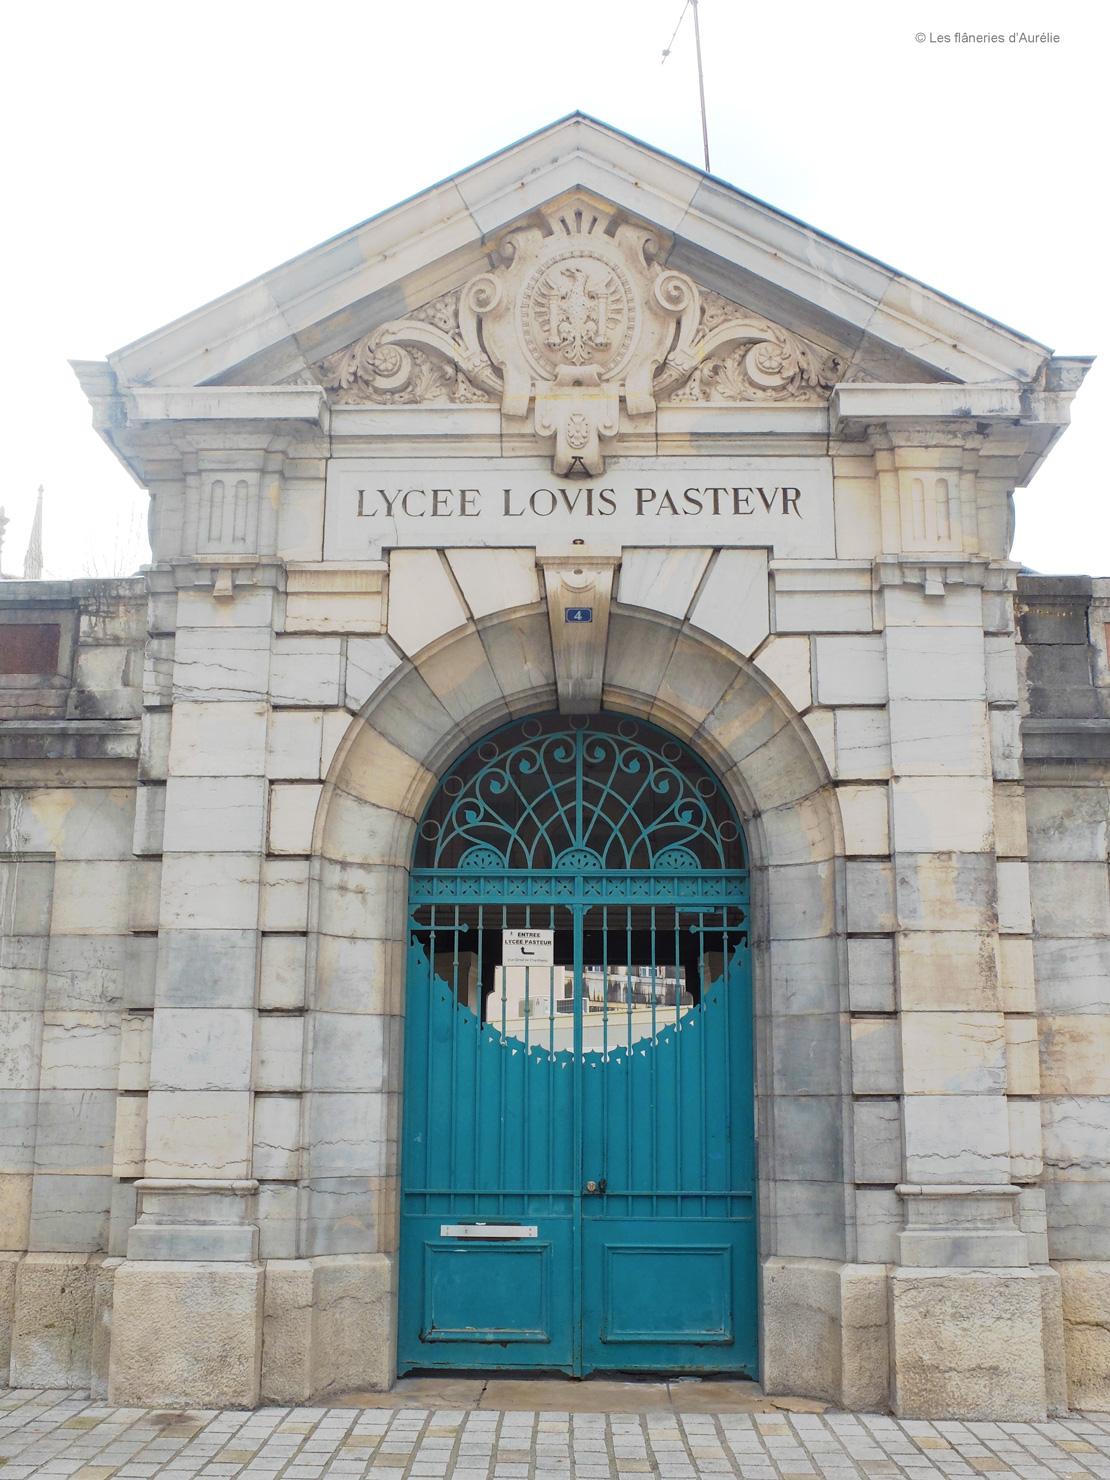 Lycee.Louis.Pasteur